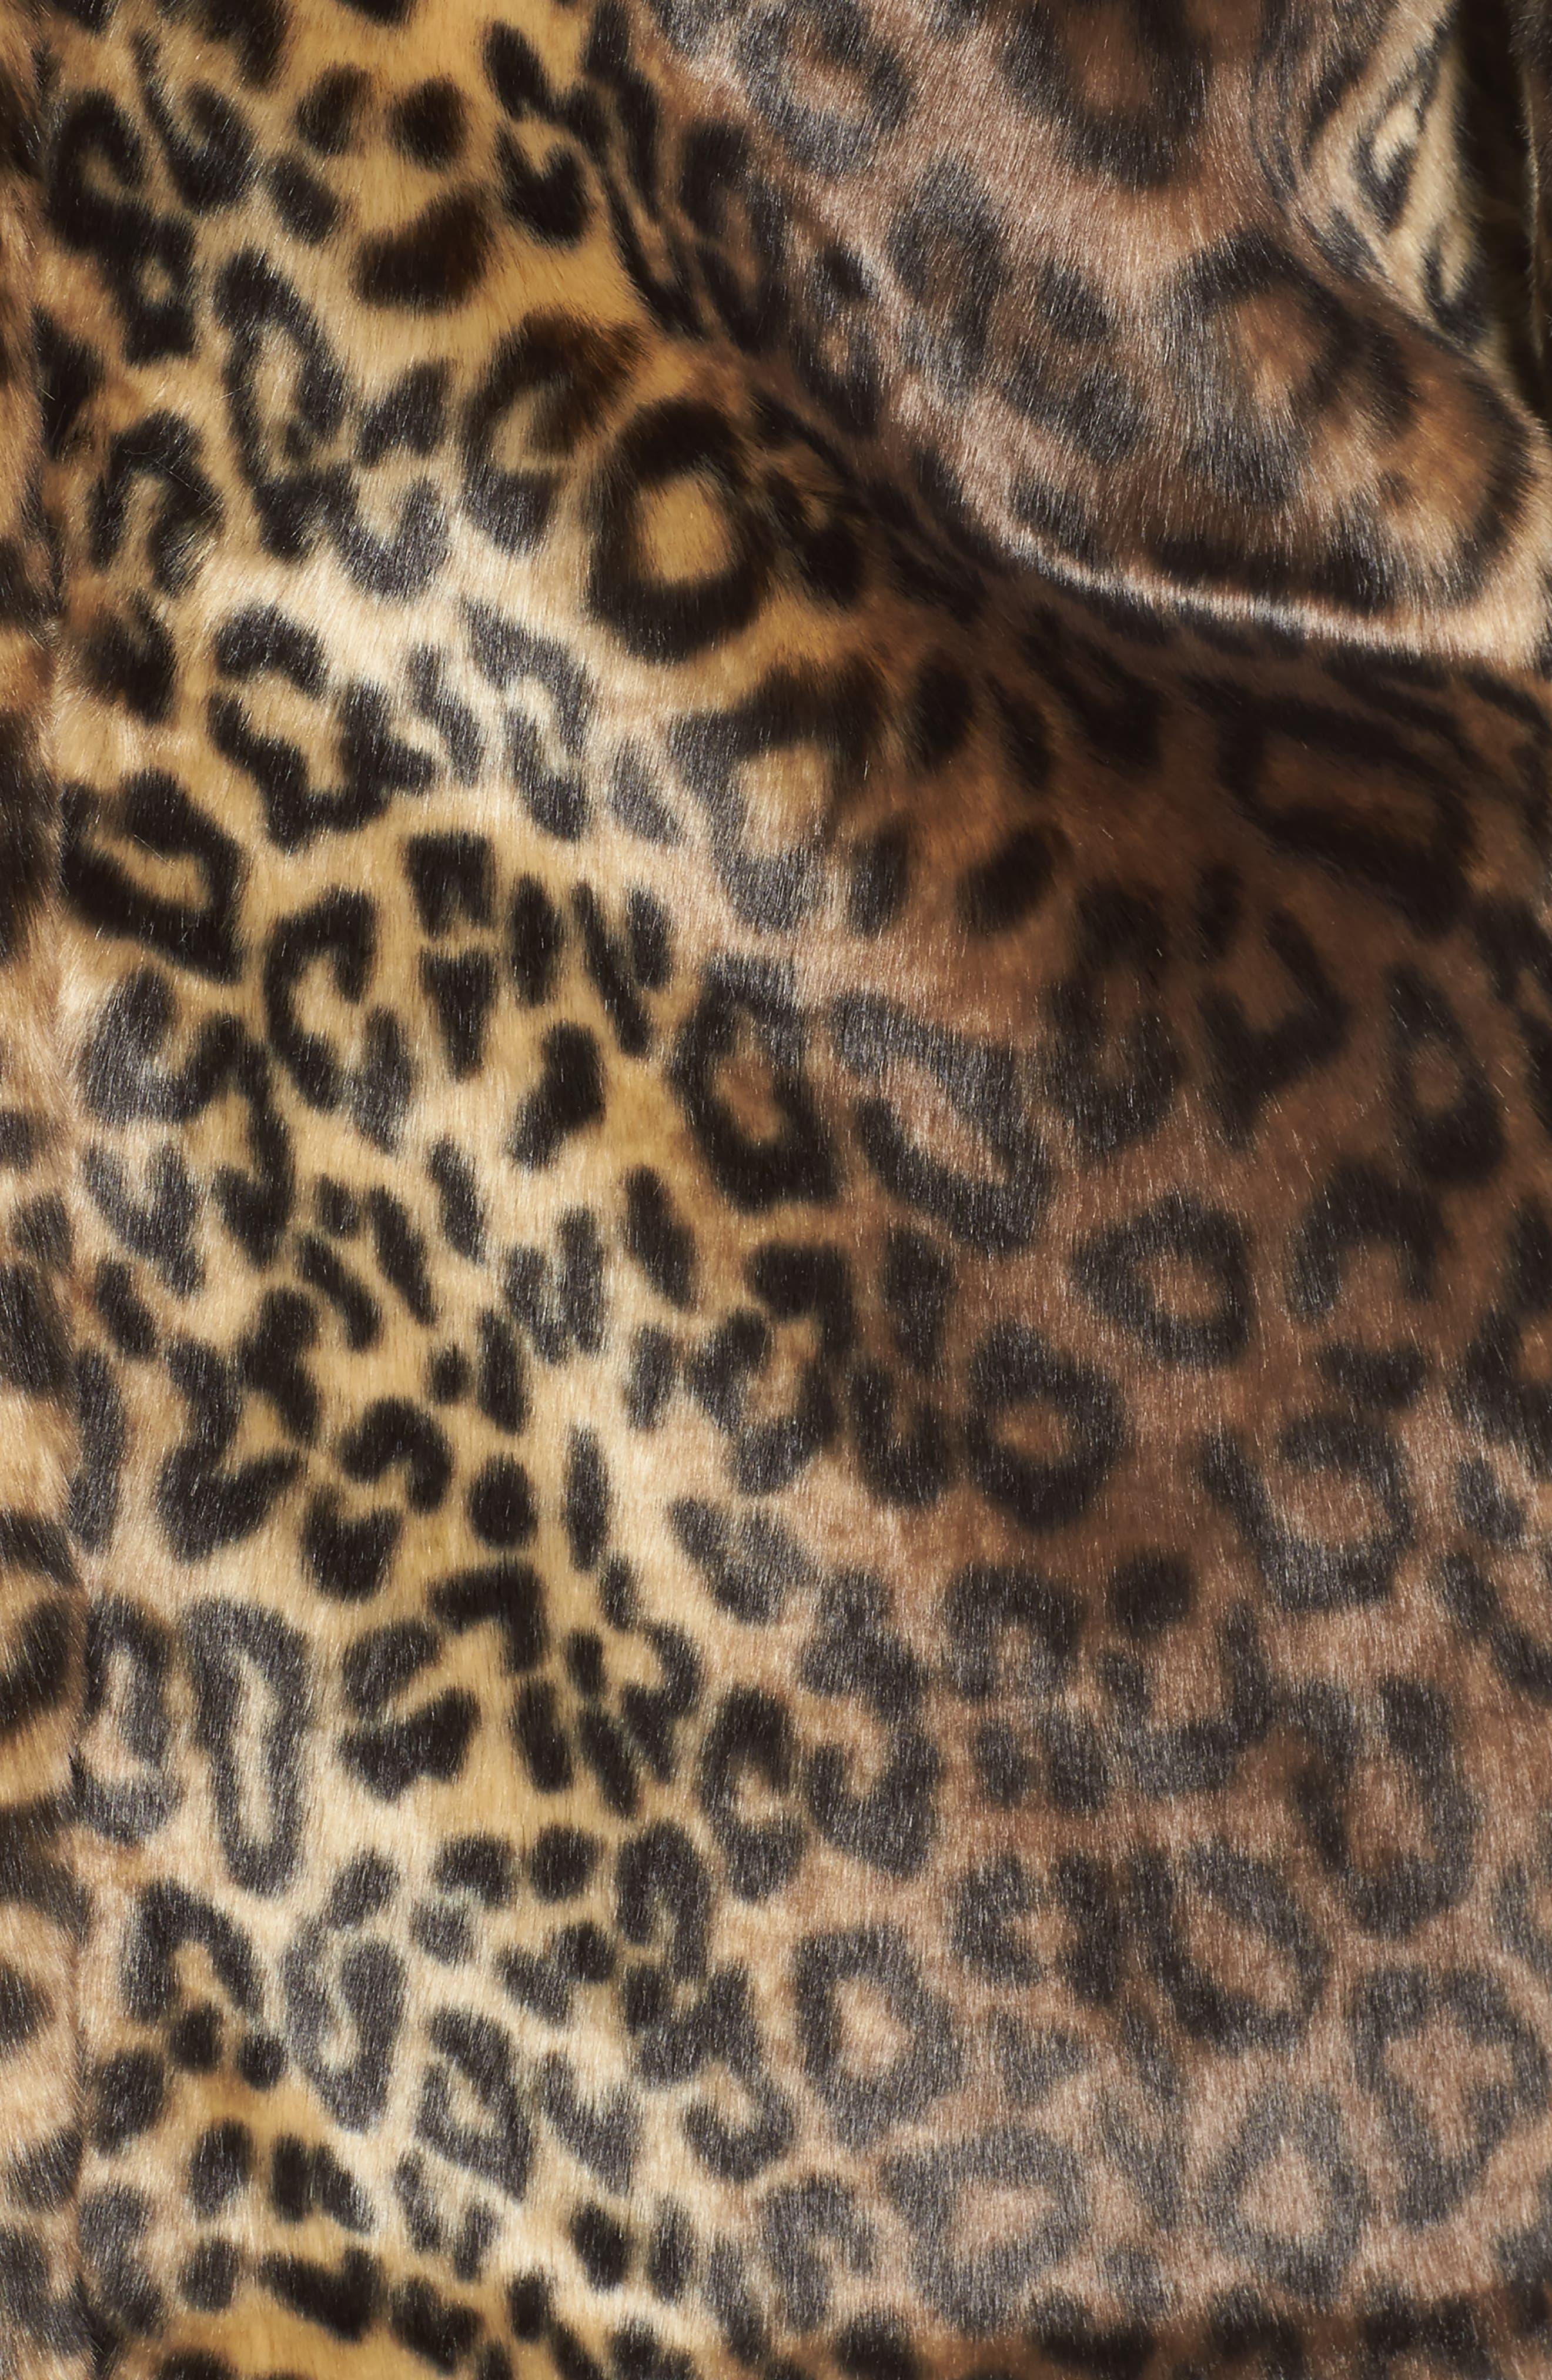 Reversible Cheetah Print Faux Fur Jacket,                             Alternate thumbnail 6, color,                             254